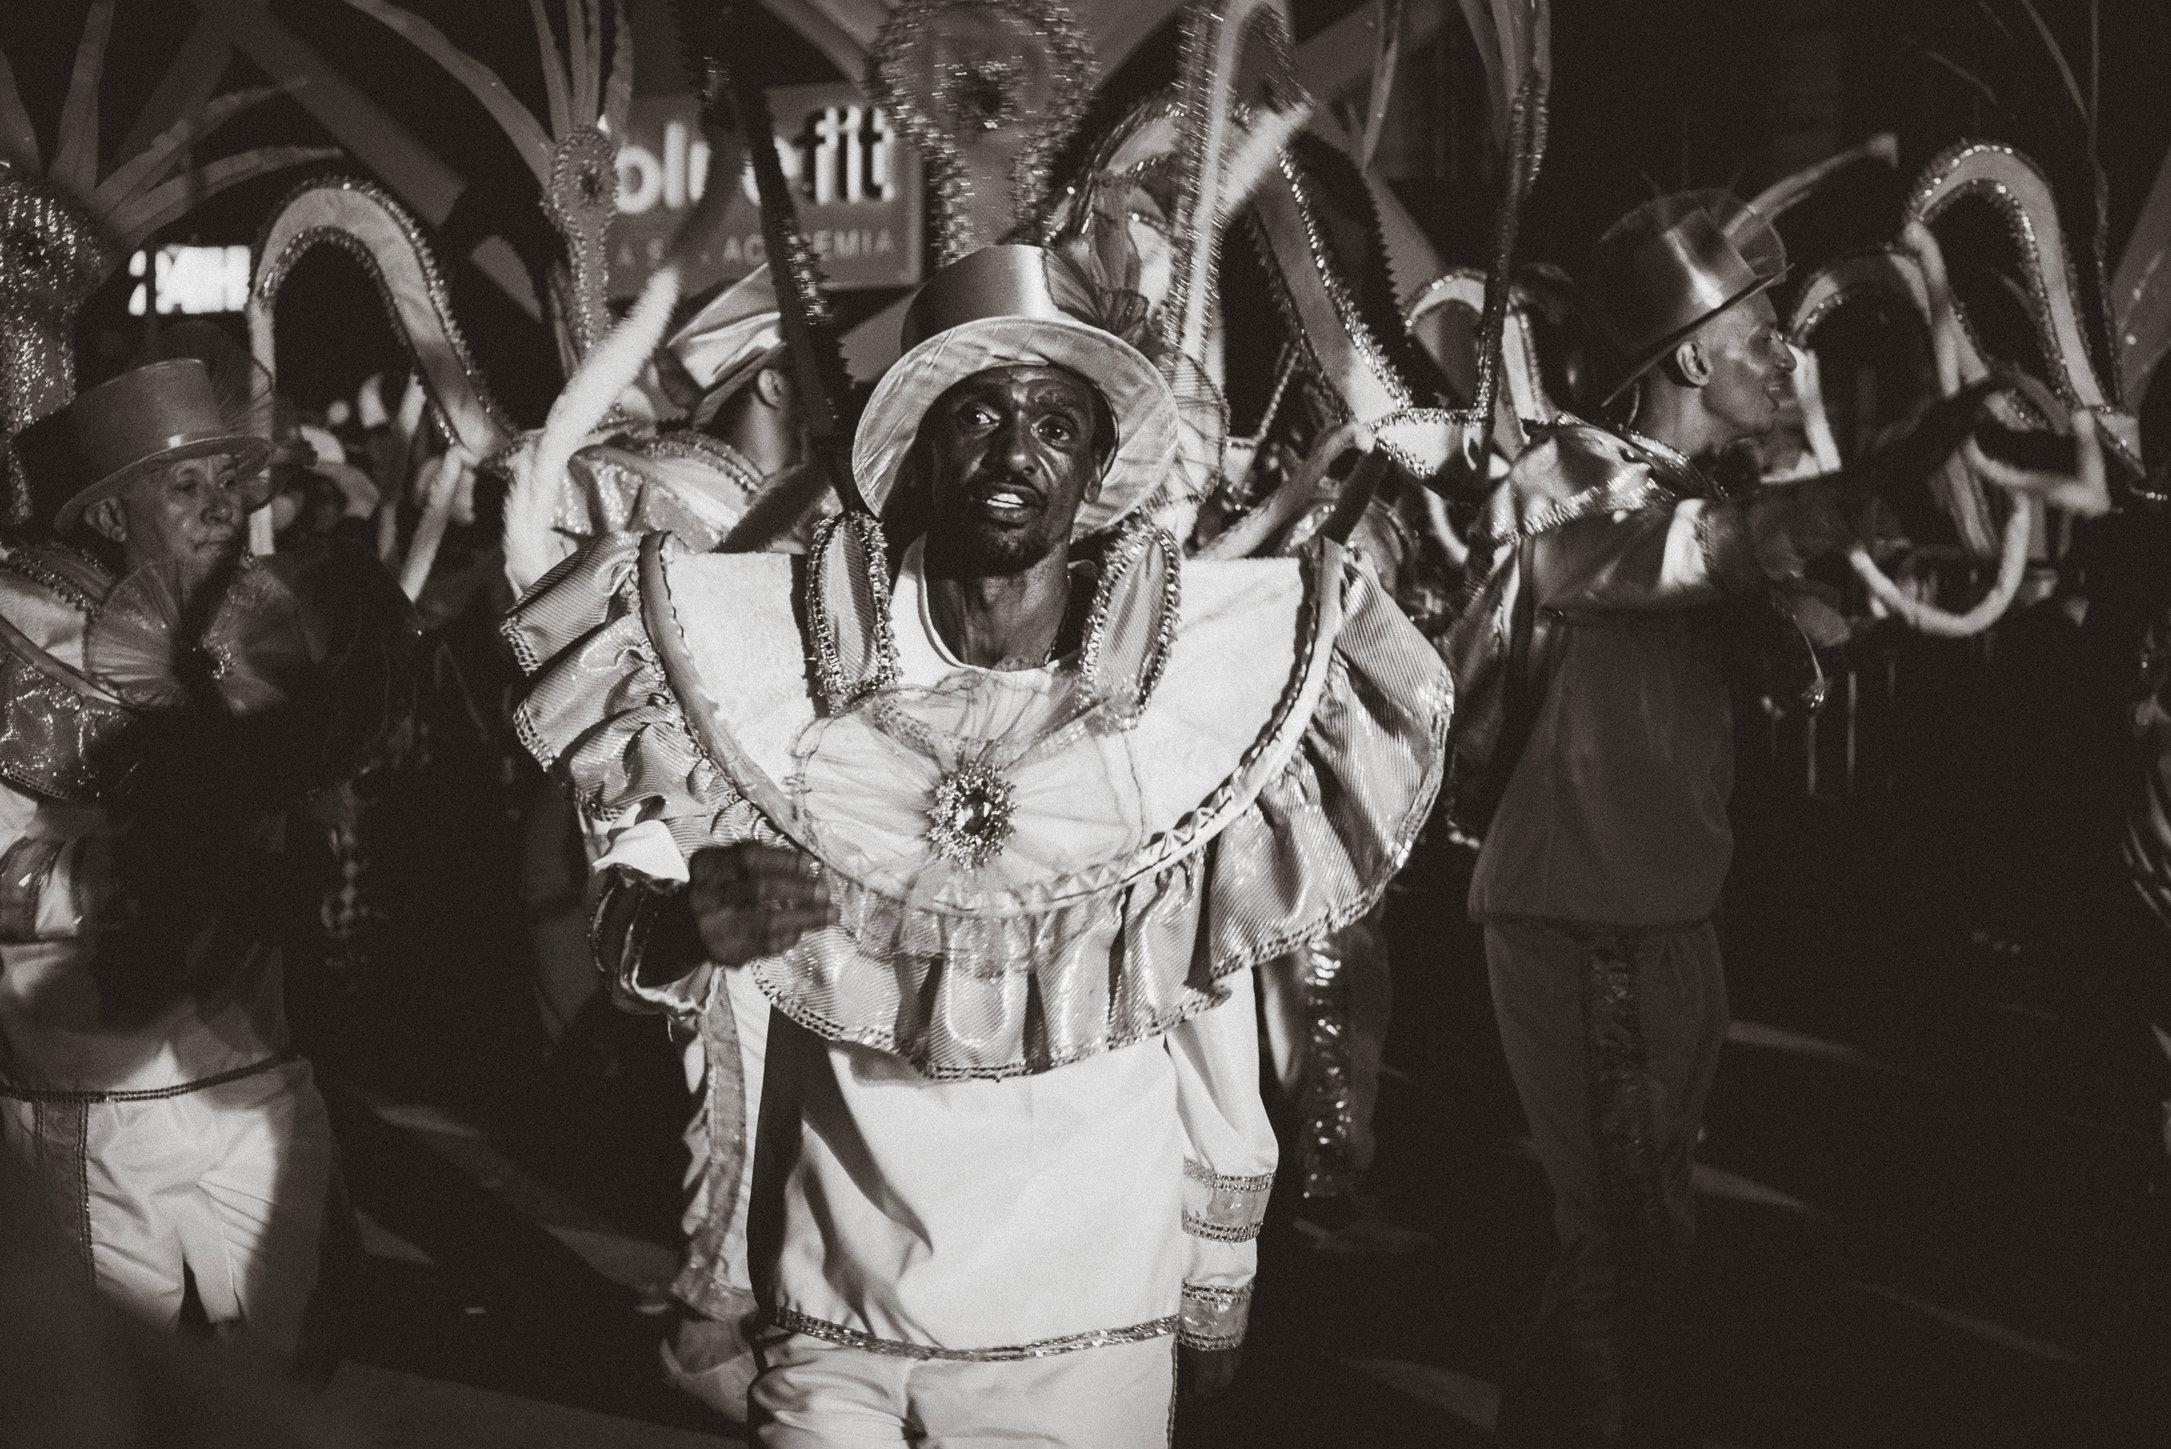 20180211-Carnaval-103.jpg